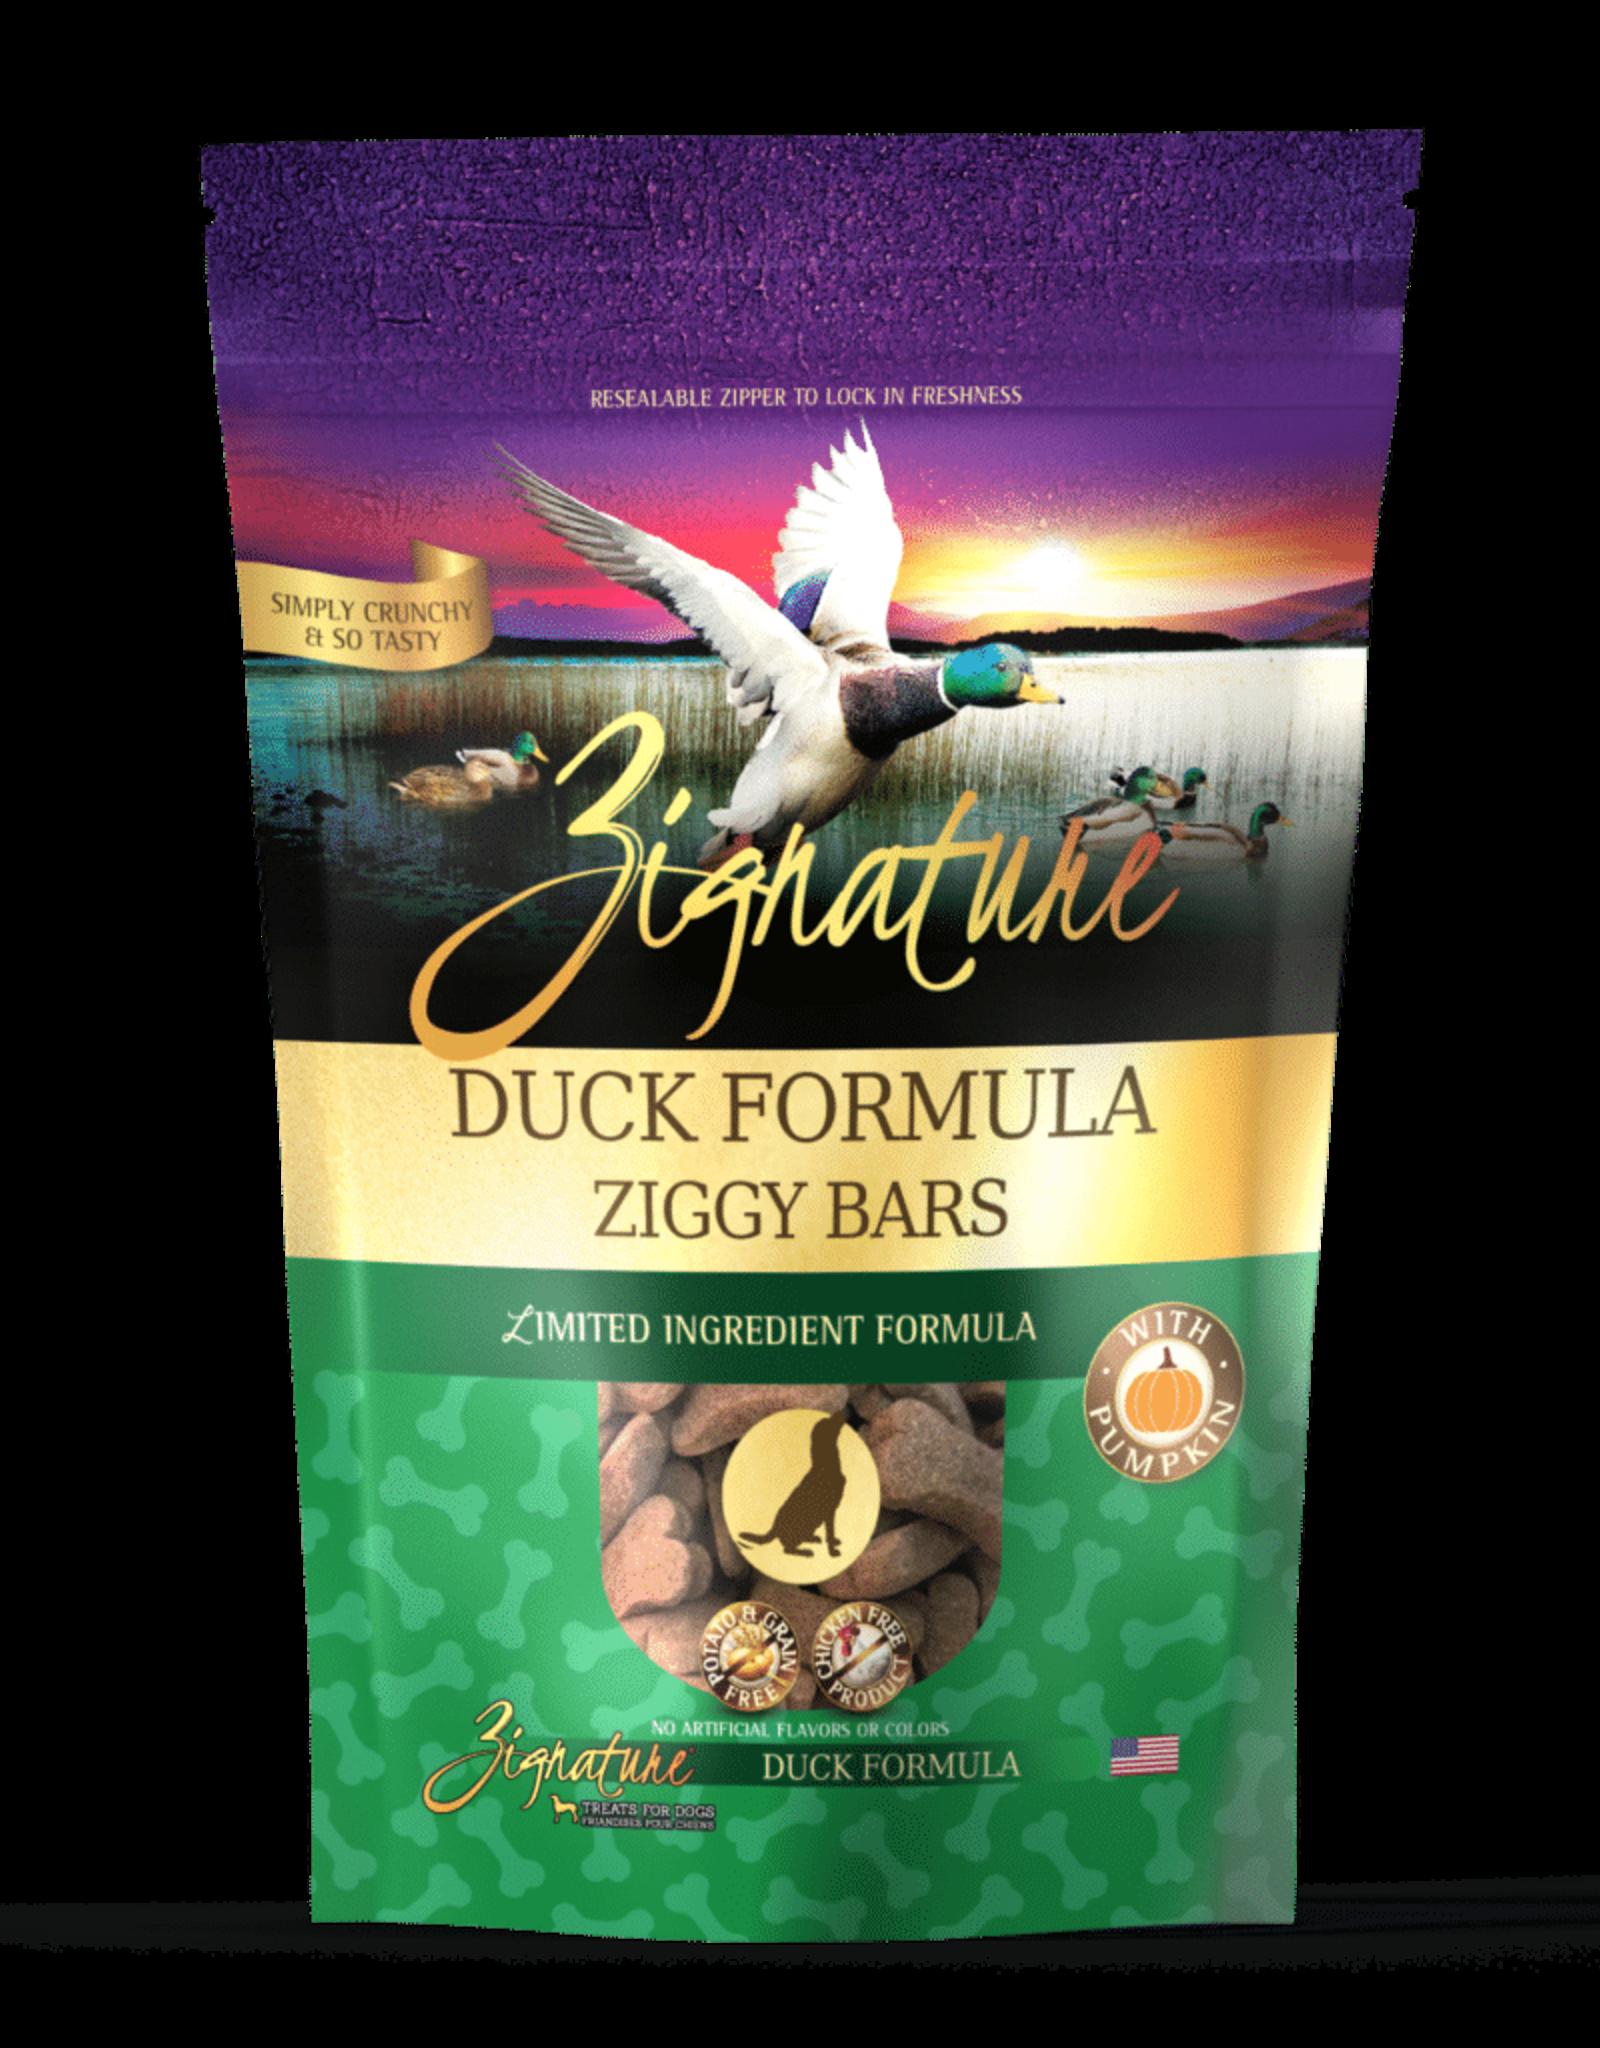 Zignature Ziggy Bar Duck Formula - 12oz